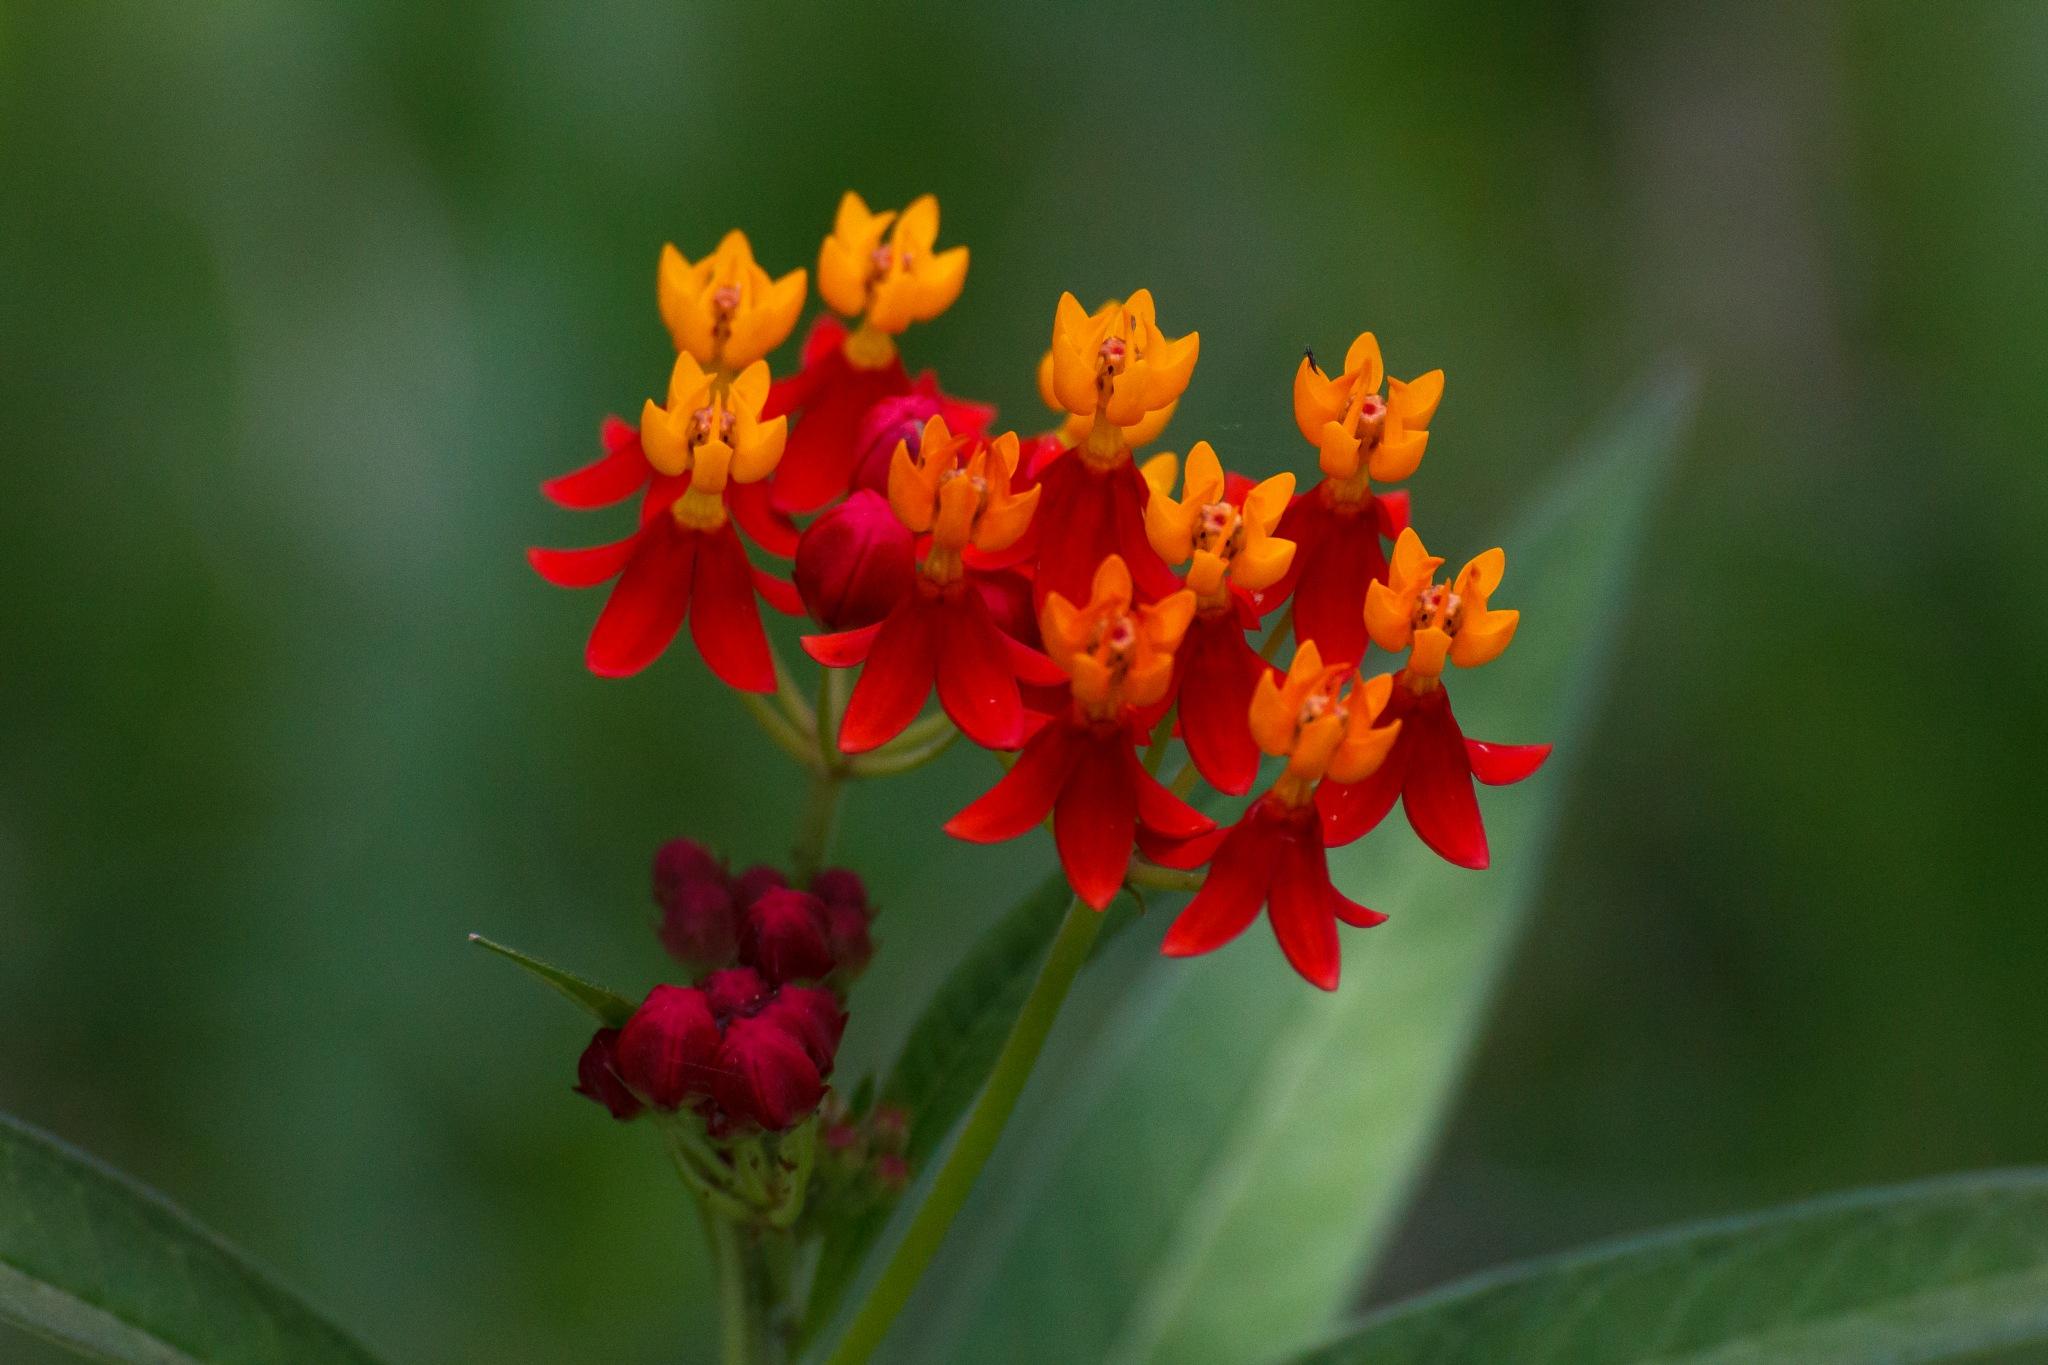 Red in Nature  by vishwaswatwe